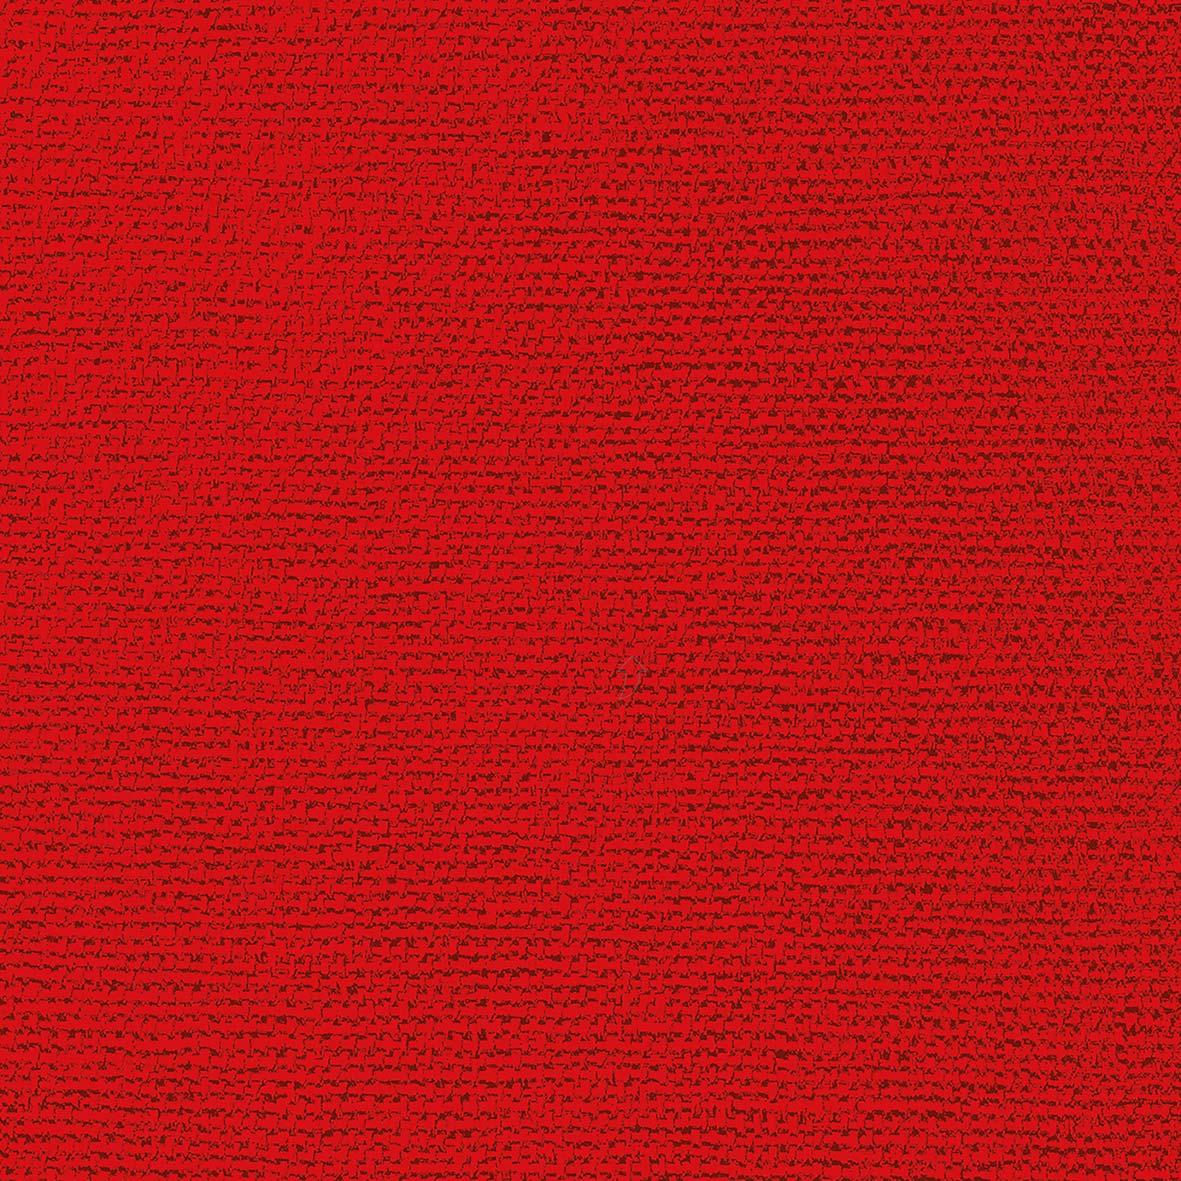 Canvas red Napkin 33x33